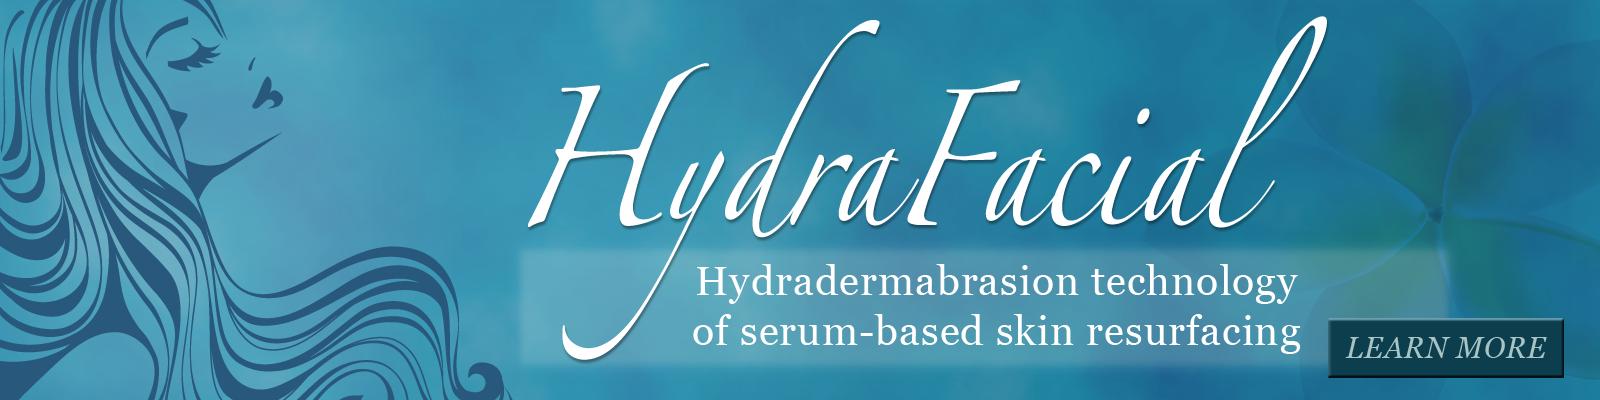 HydraFacial, hydradermabrasion technology